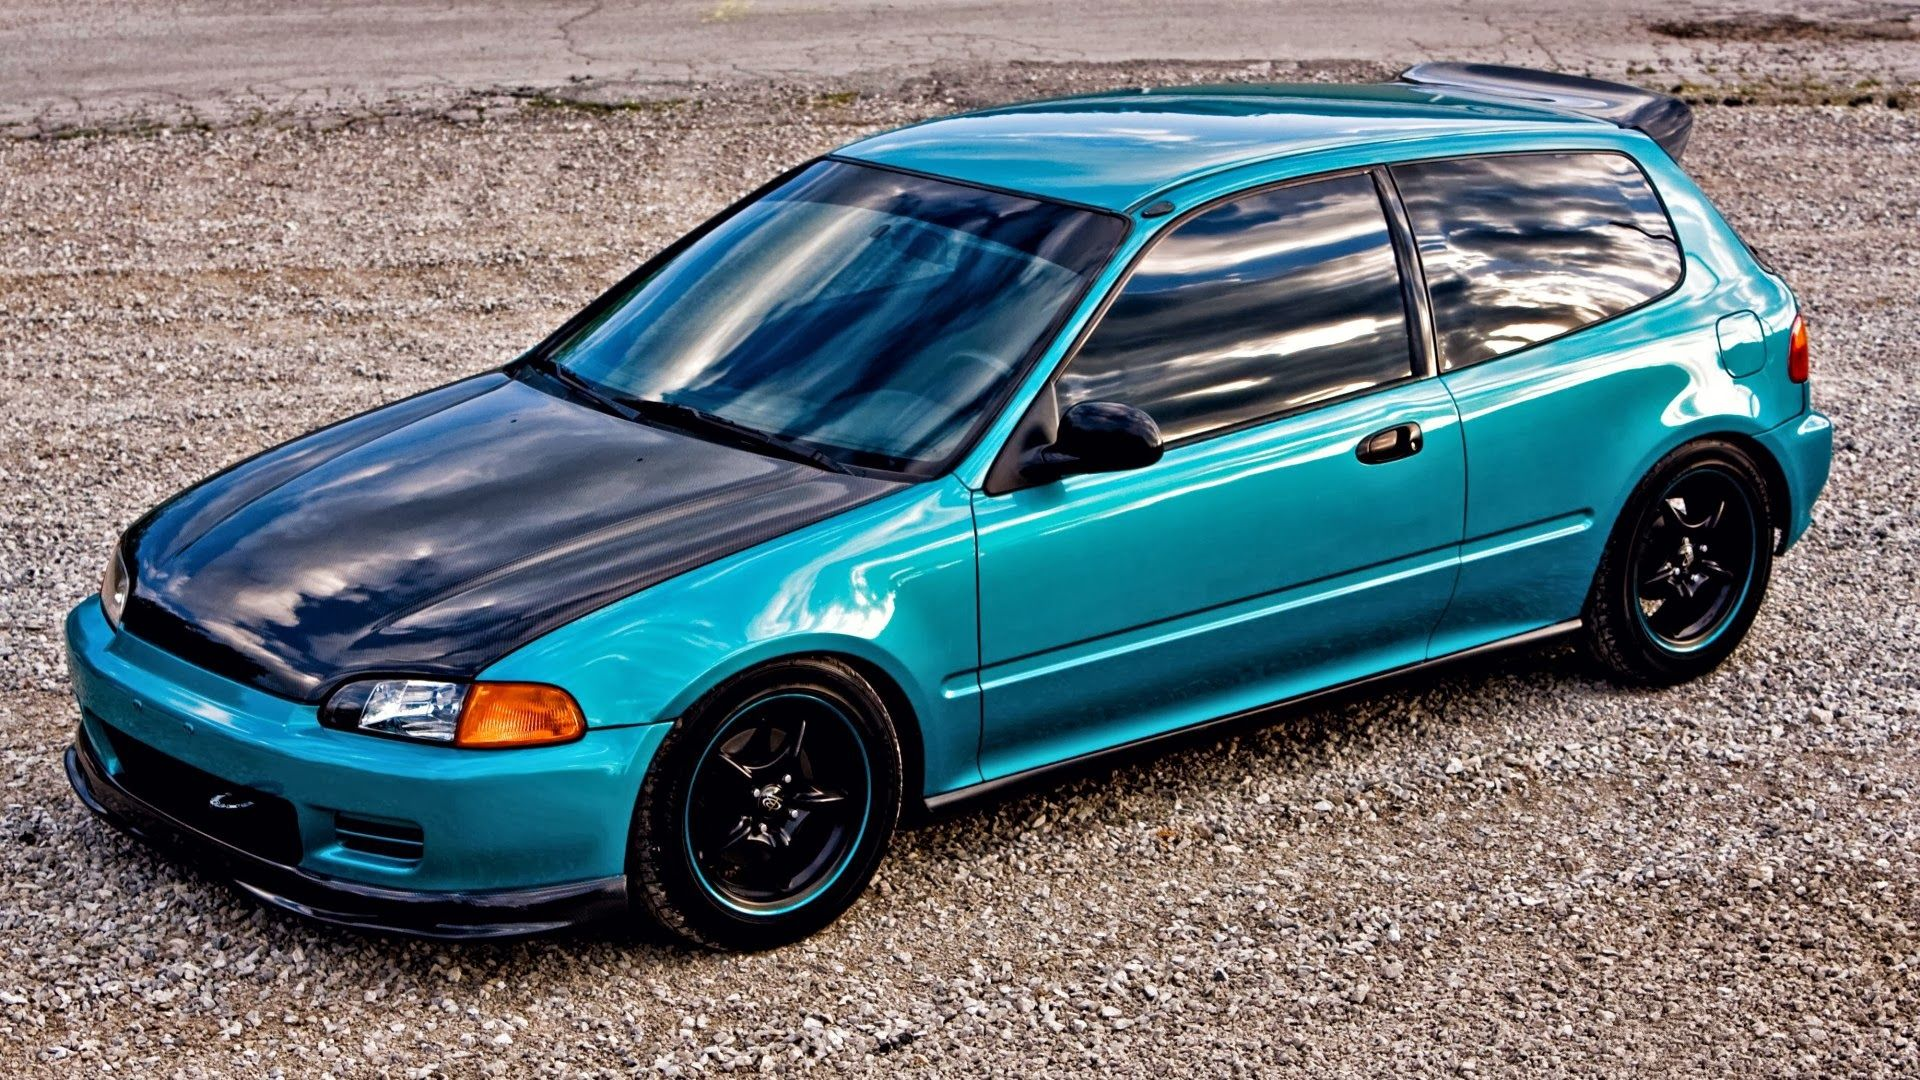 honda civic Honda civic vtec, Honda civic hatchback